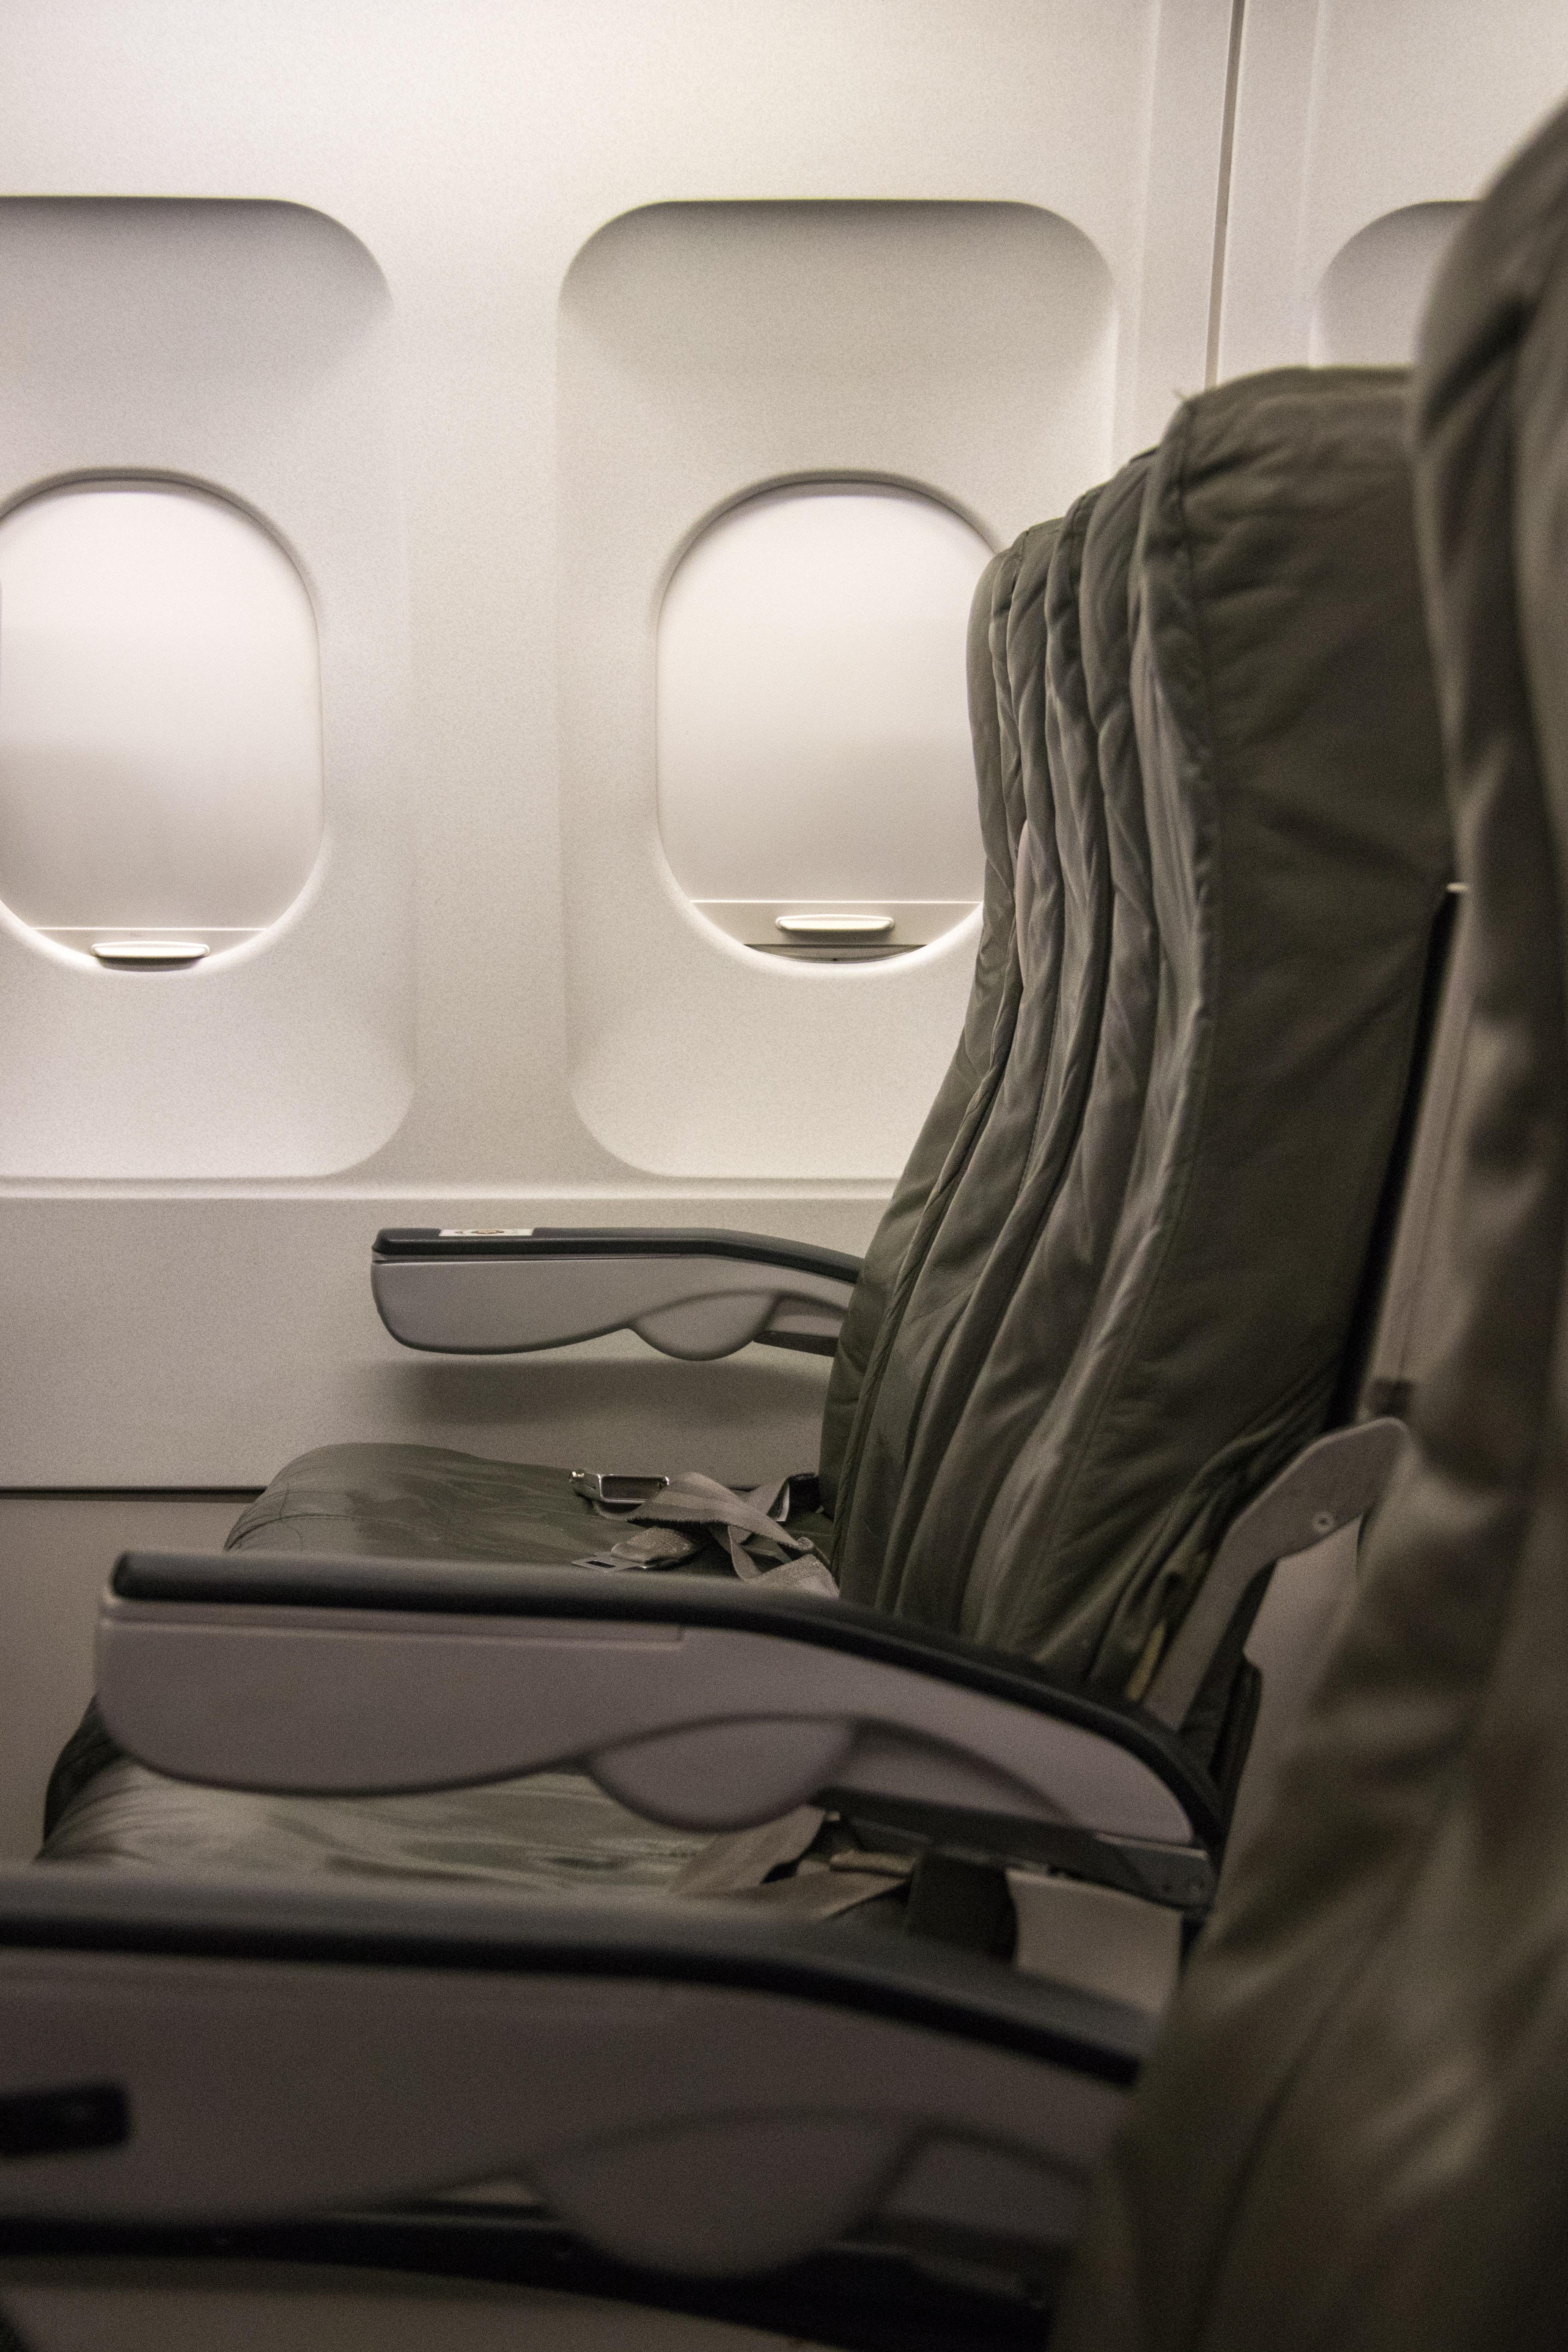 unoccupied plane seats